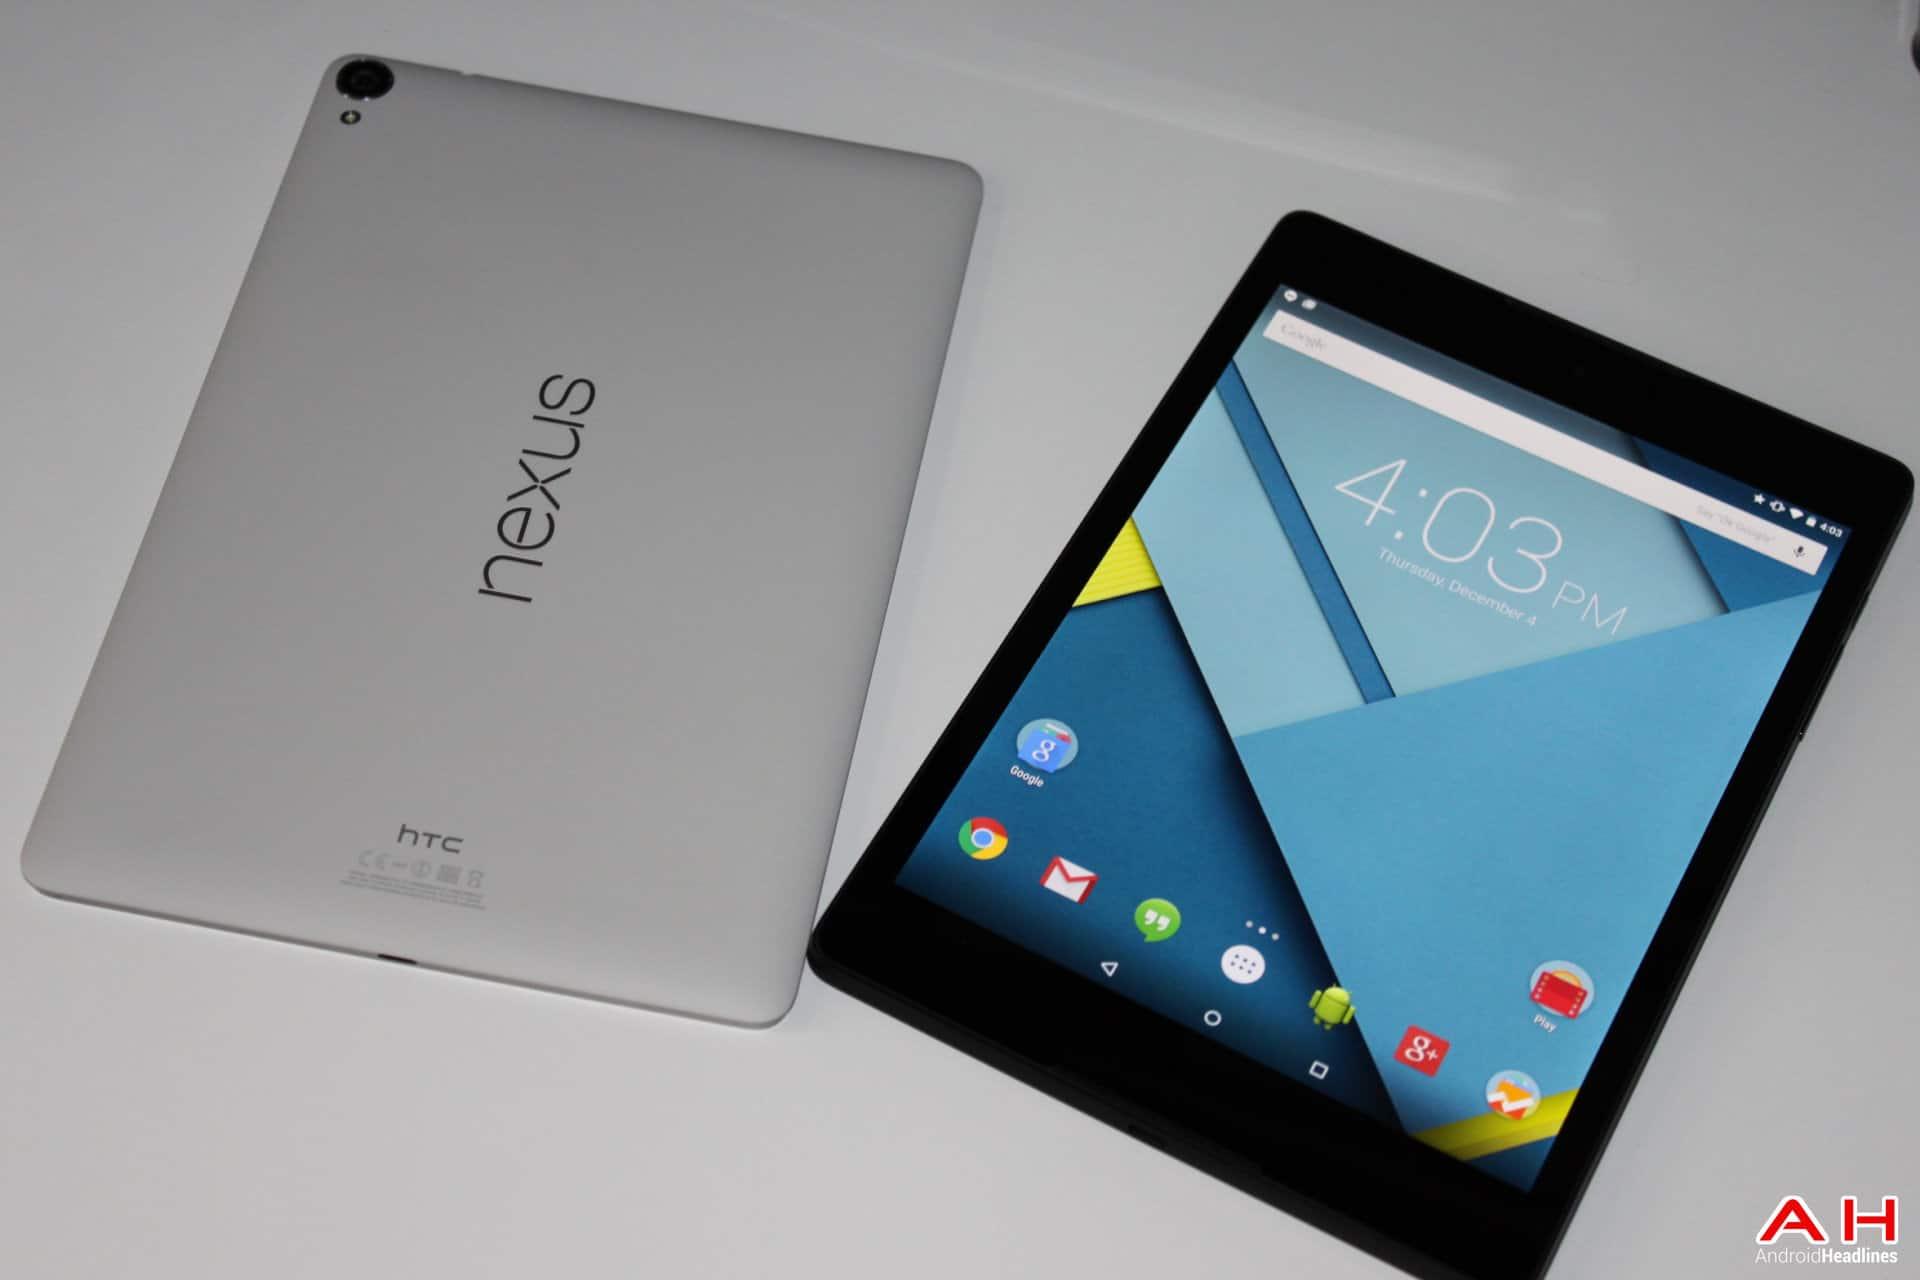 AH Nexus 9 - 4 back and white Chris-59